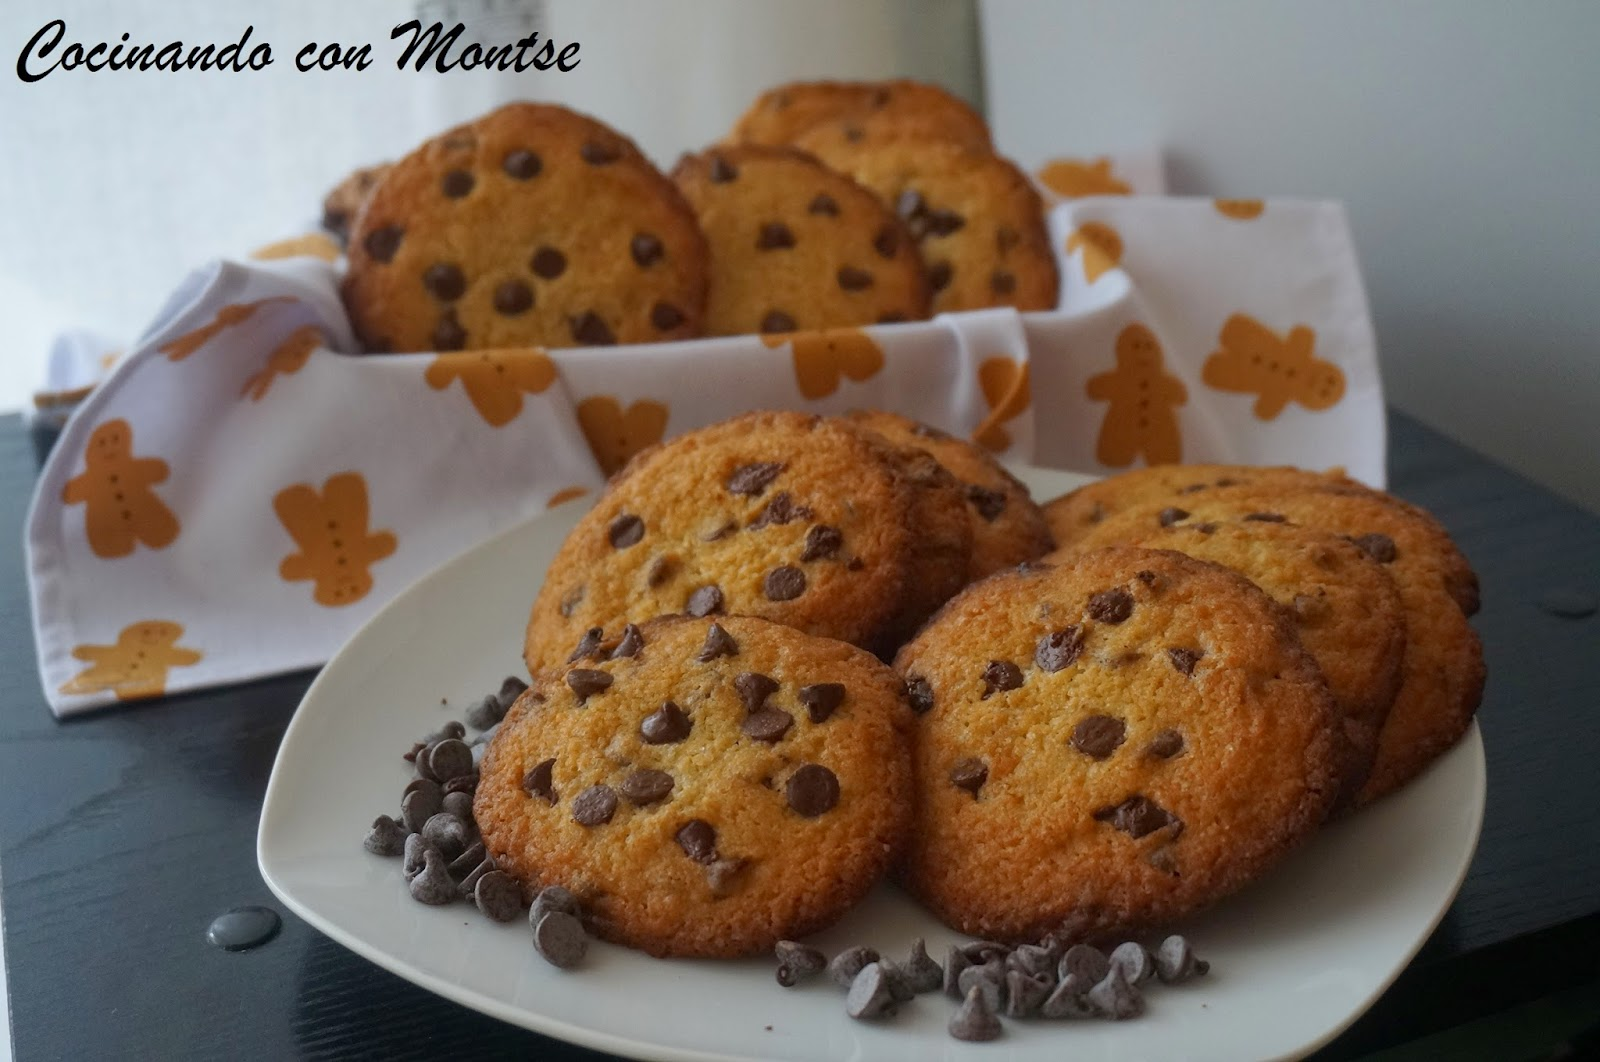 Cookies con gotas de chocolate